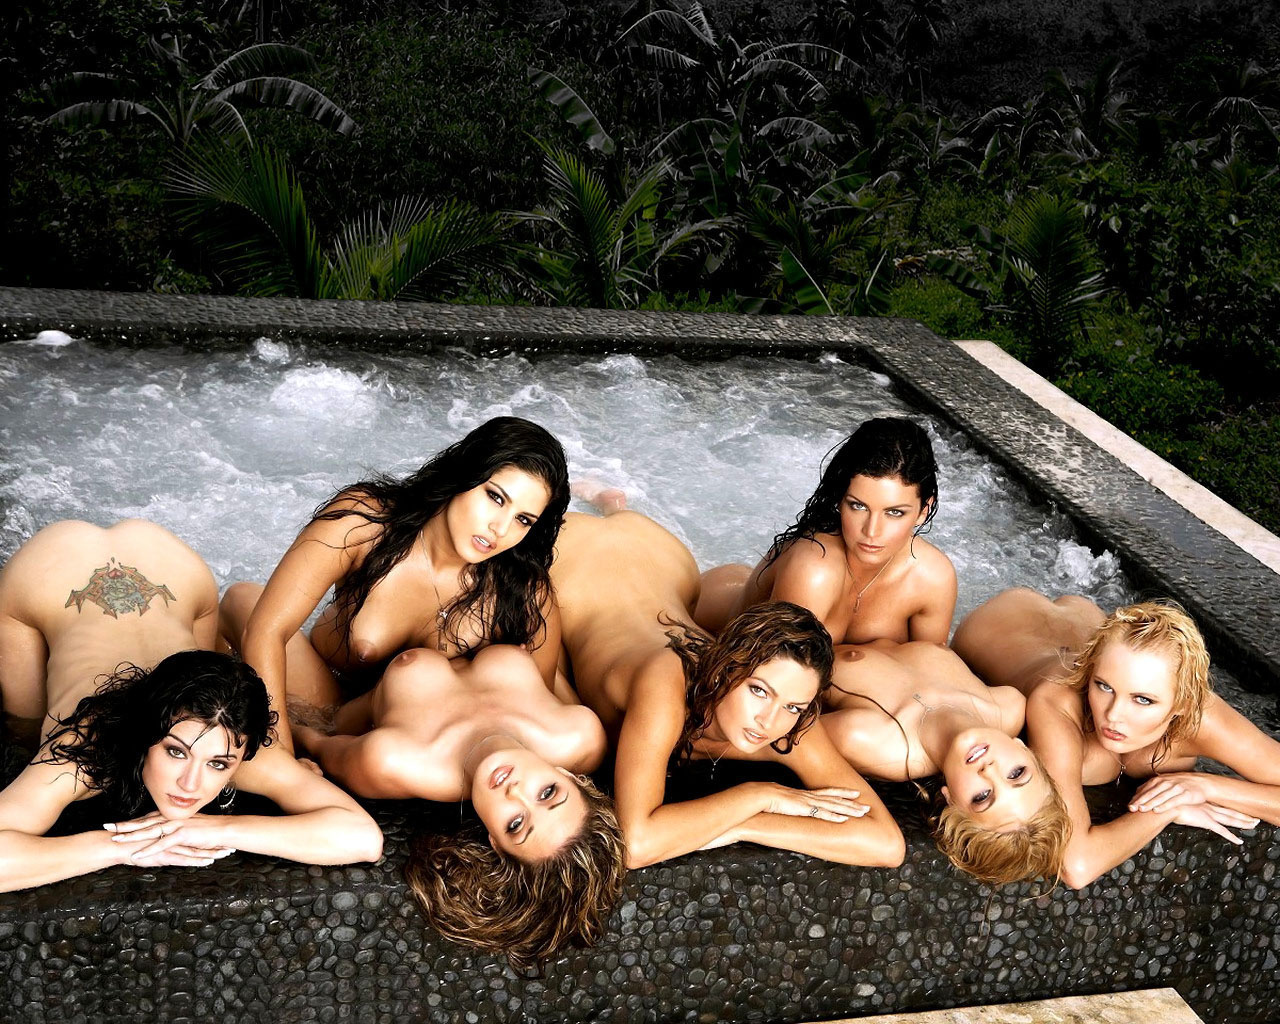 Tlc pop group nude naked